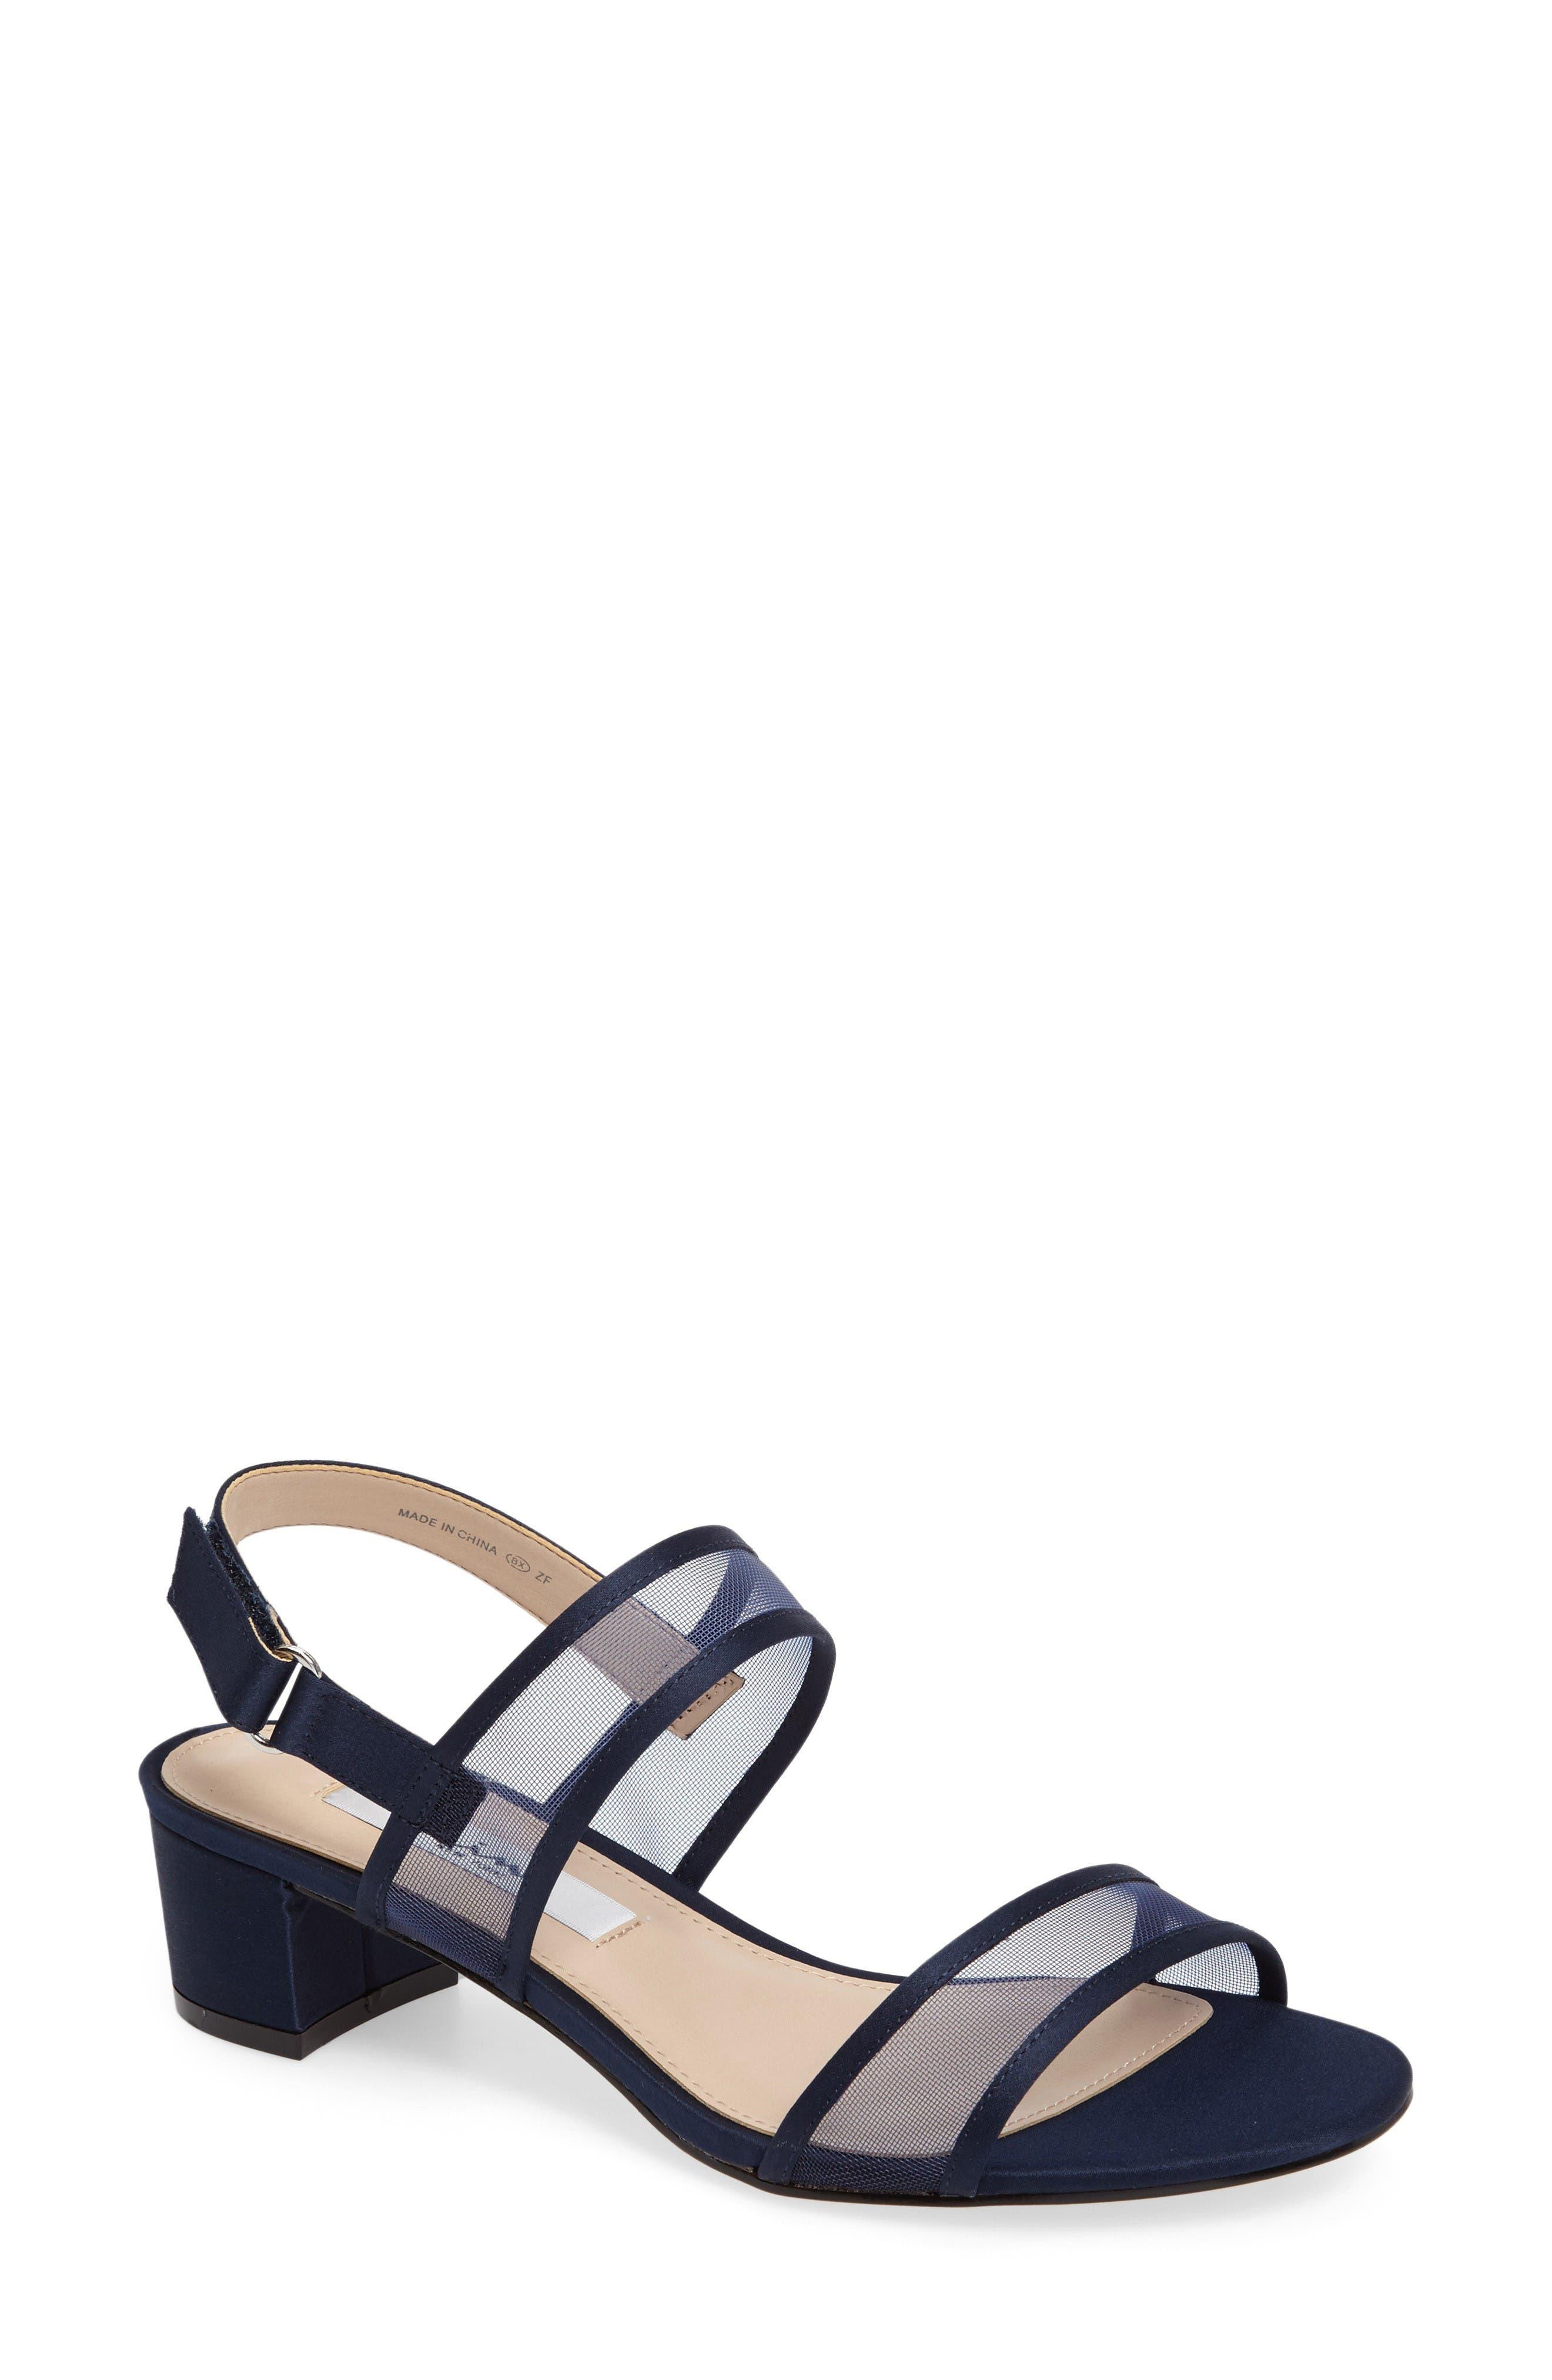 Ganice Mesh Strap Sandal,                         Main,                         color, New Navy Satin